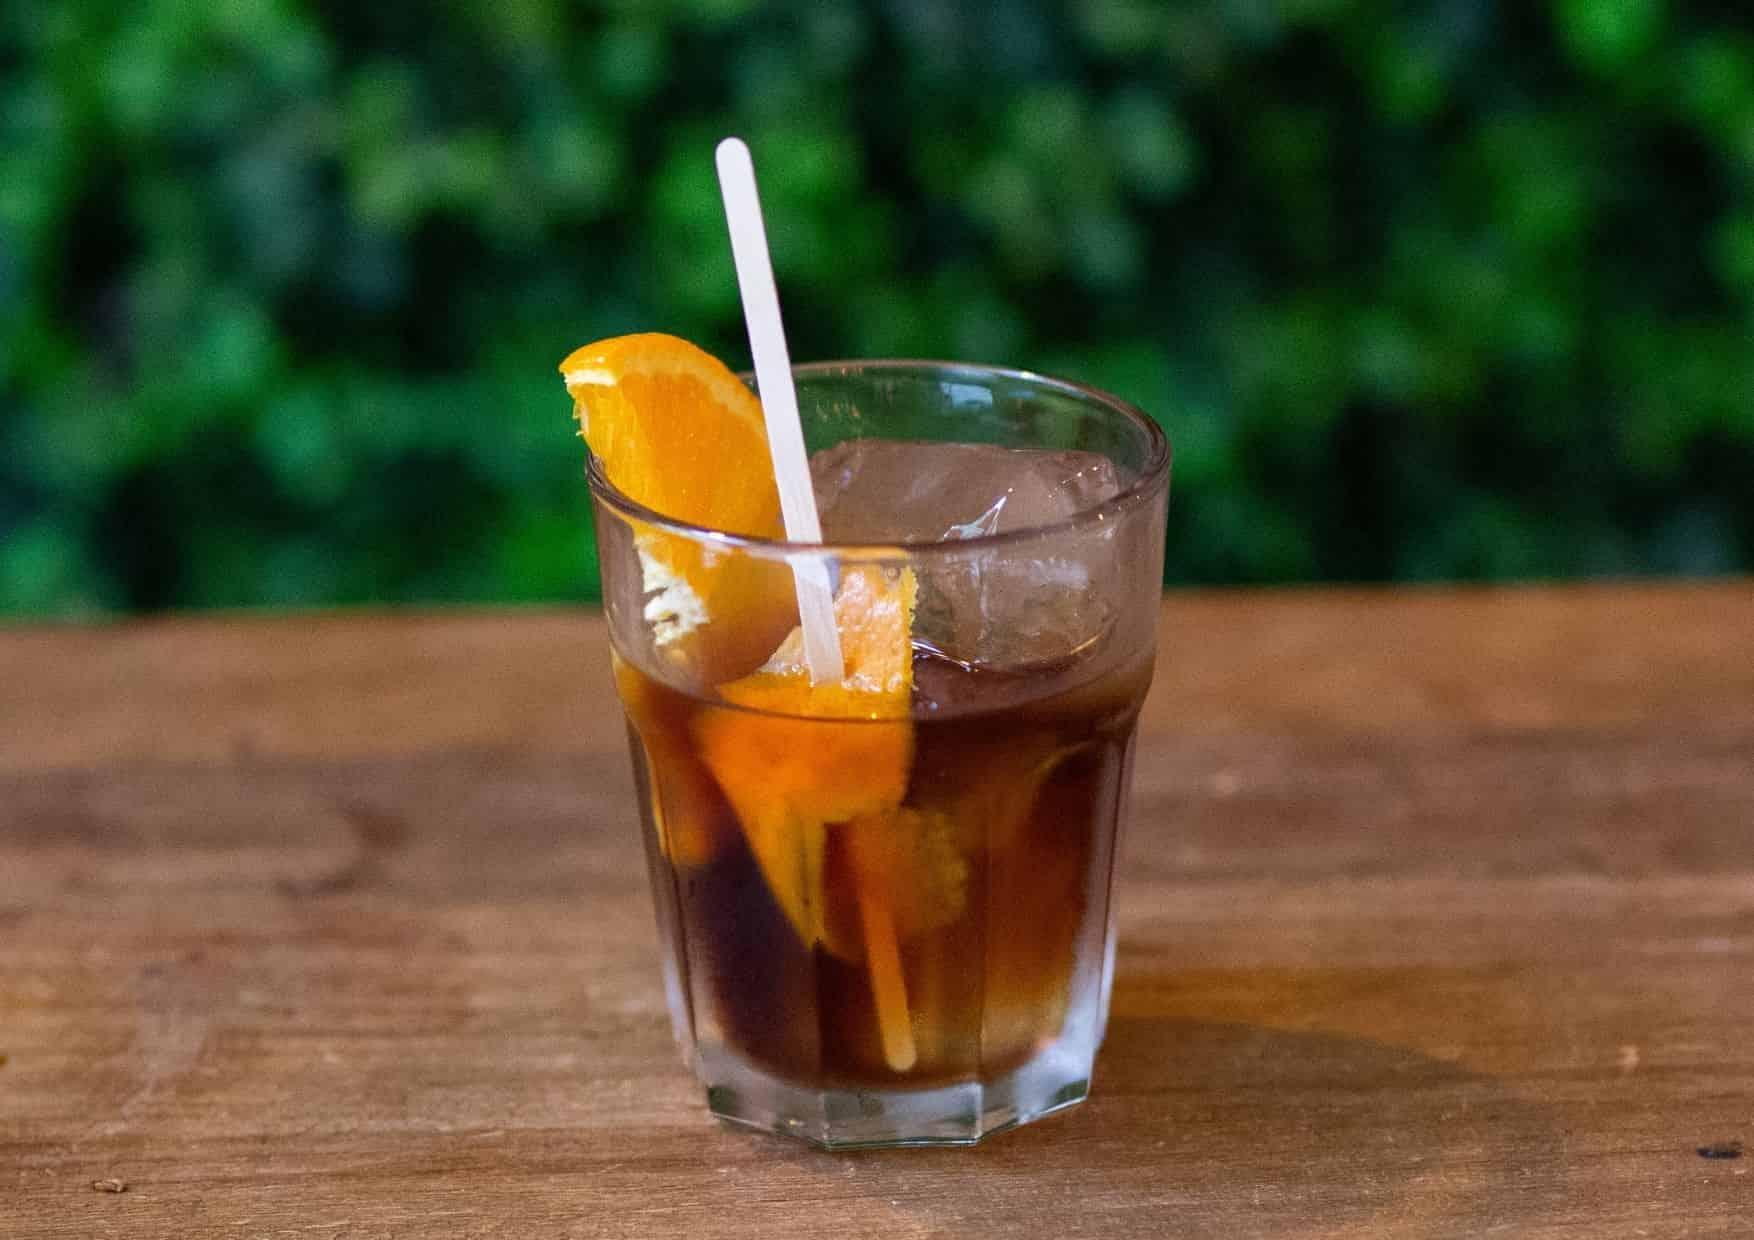 Vermut Rivera con naranja fresca - bar barcelona - cócteles barcelona - cocktail barcelona